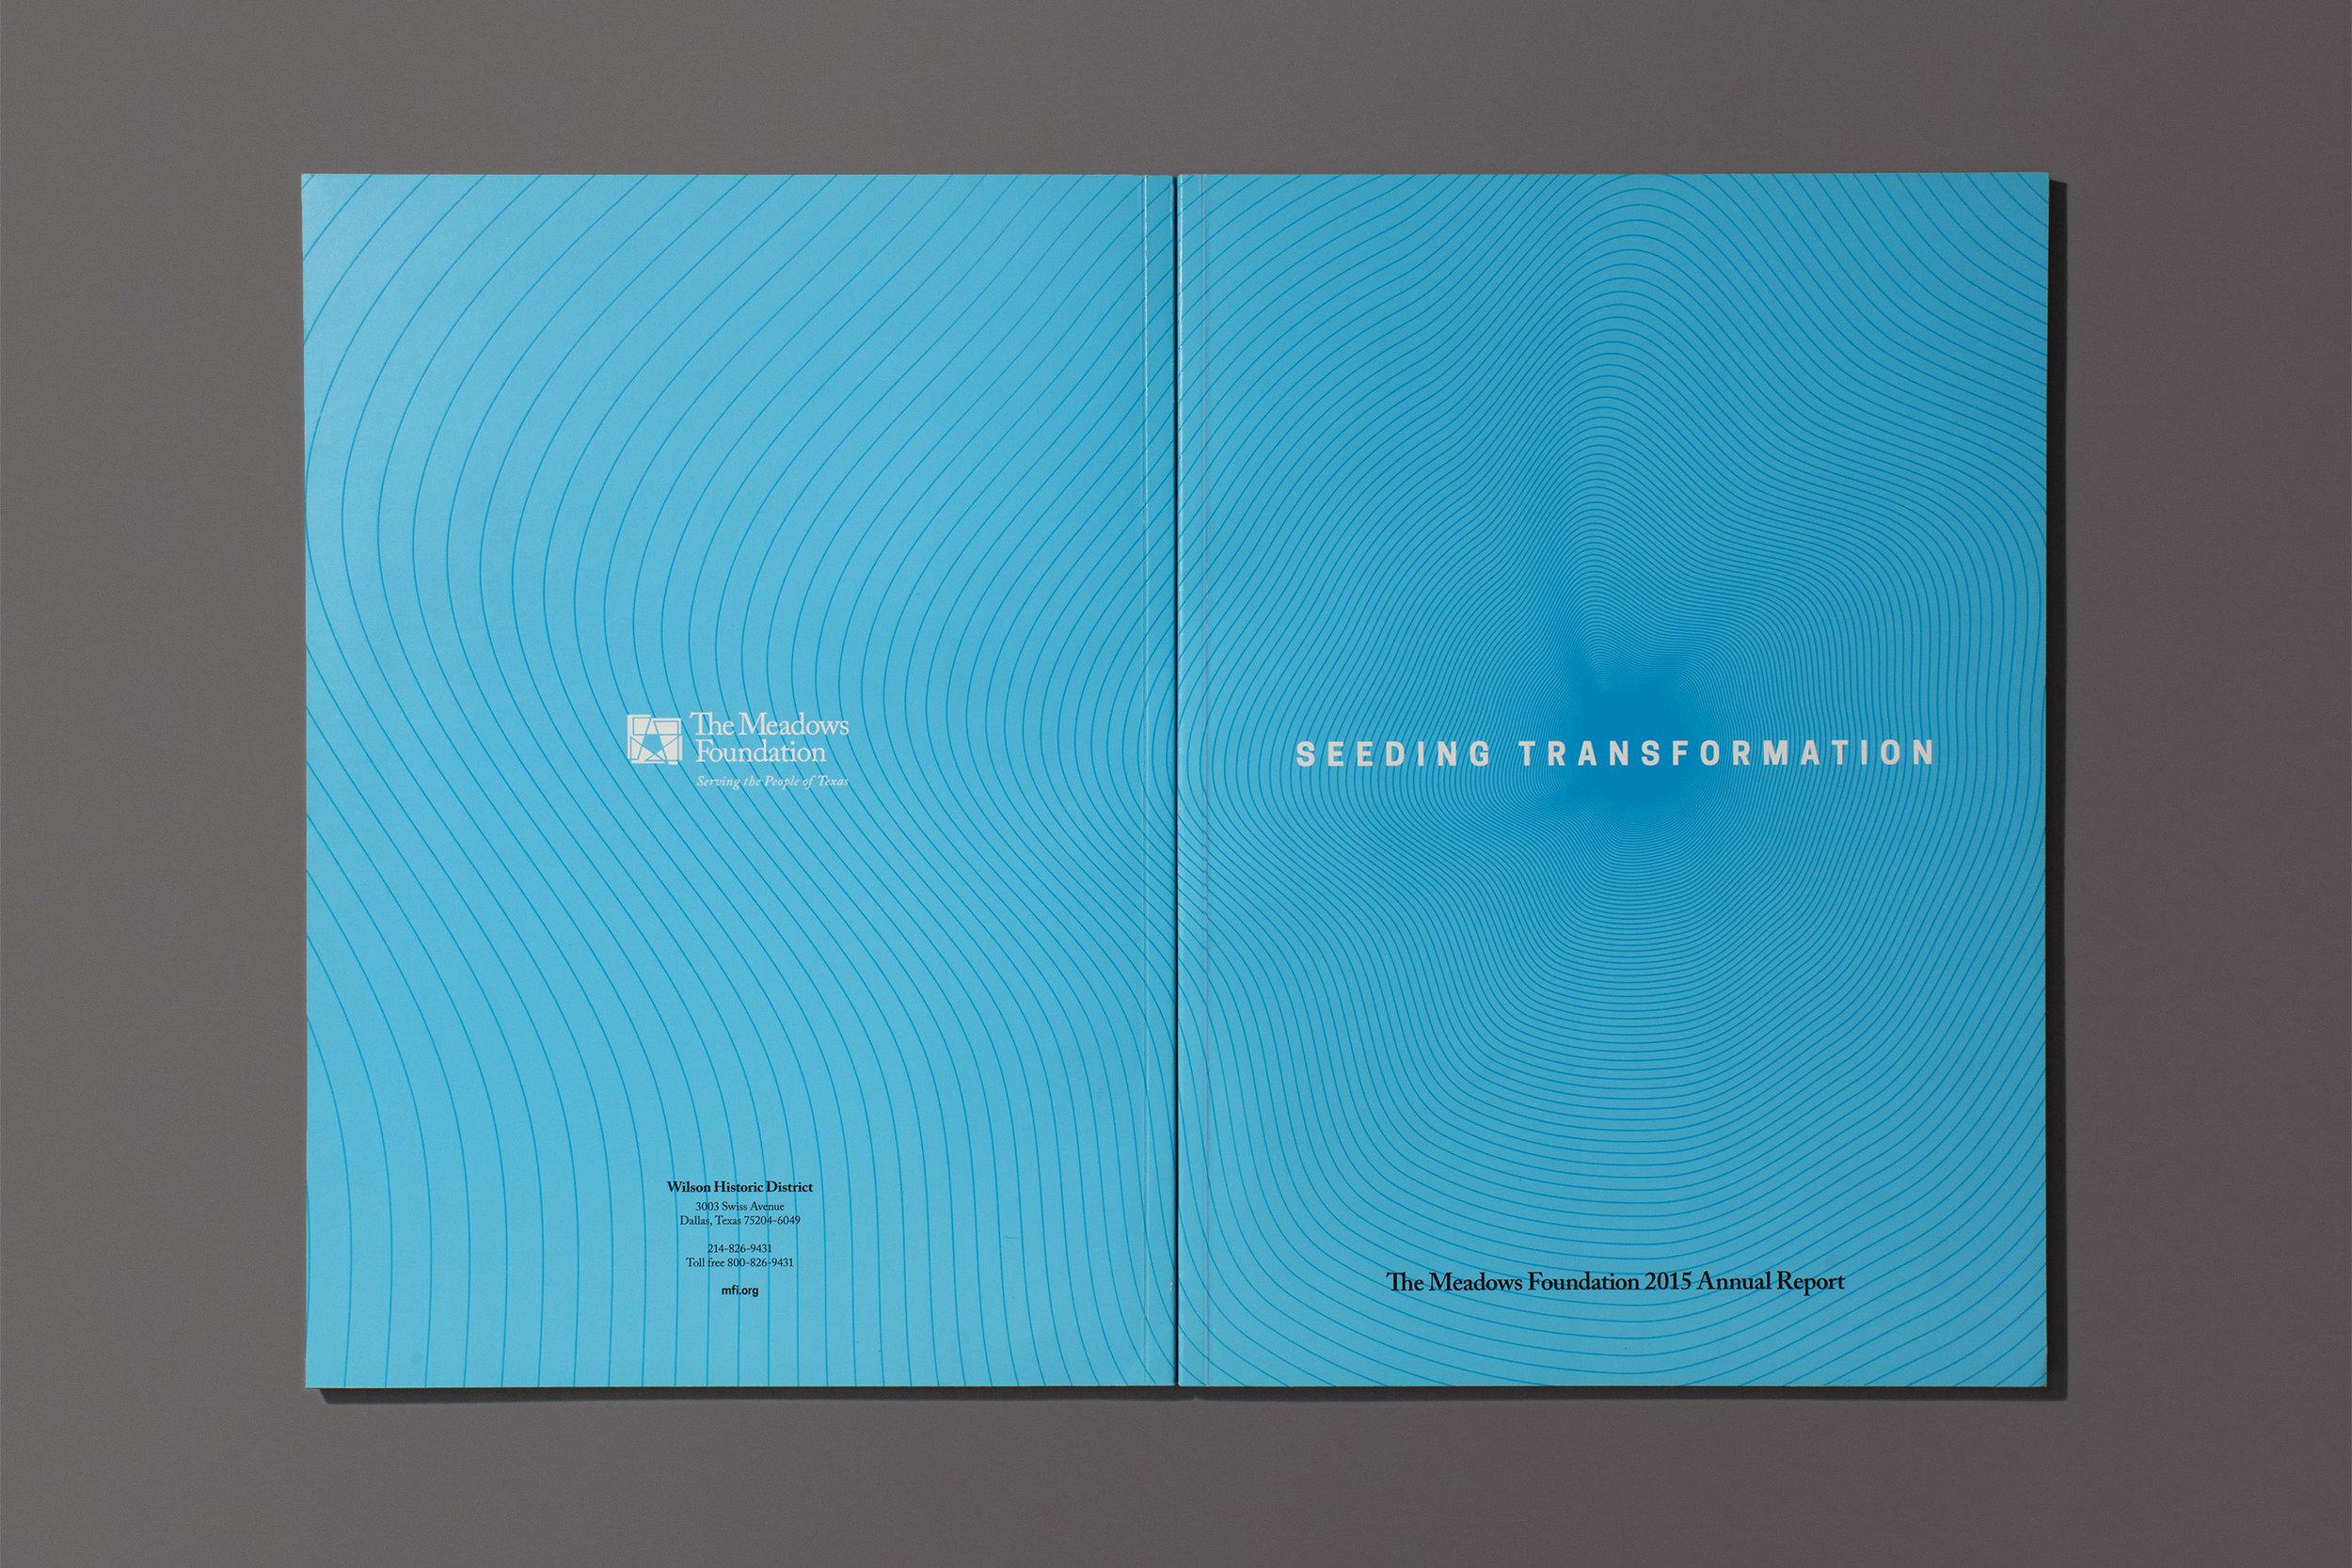 ronaldvillegas-meadows-annual-report-cover.jpg